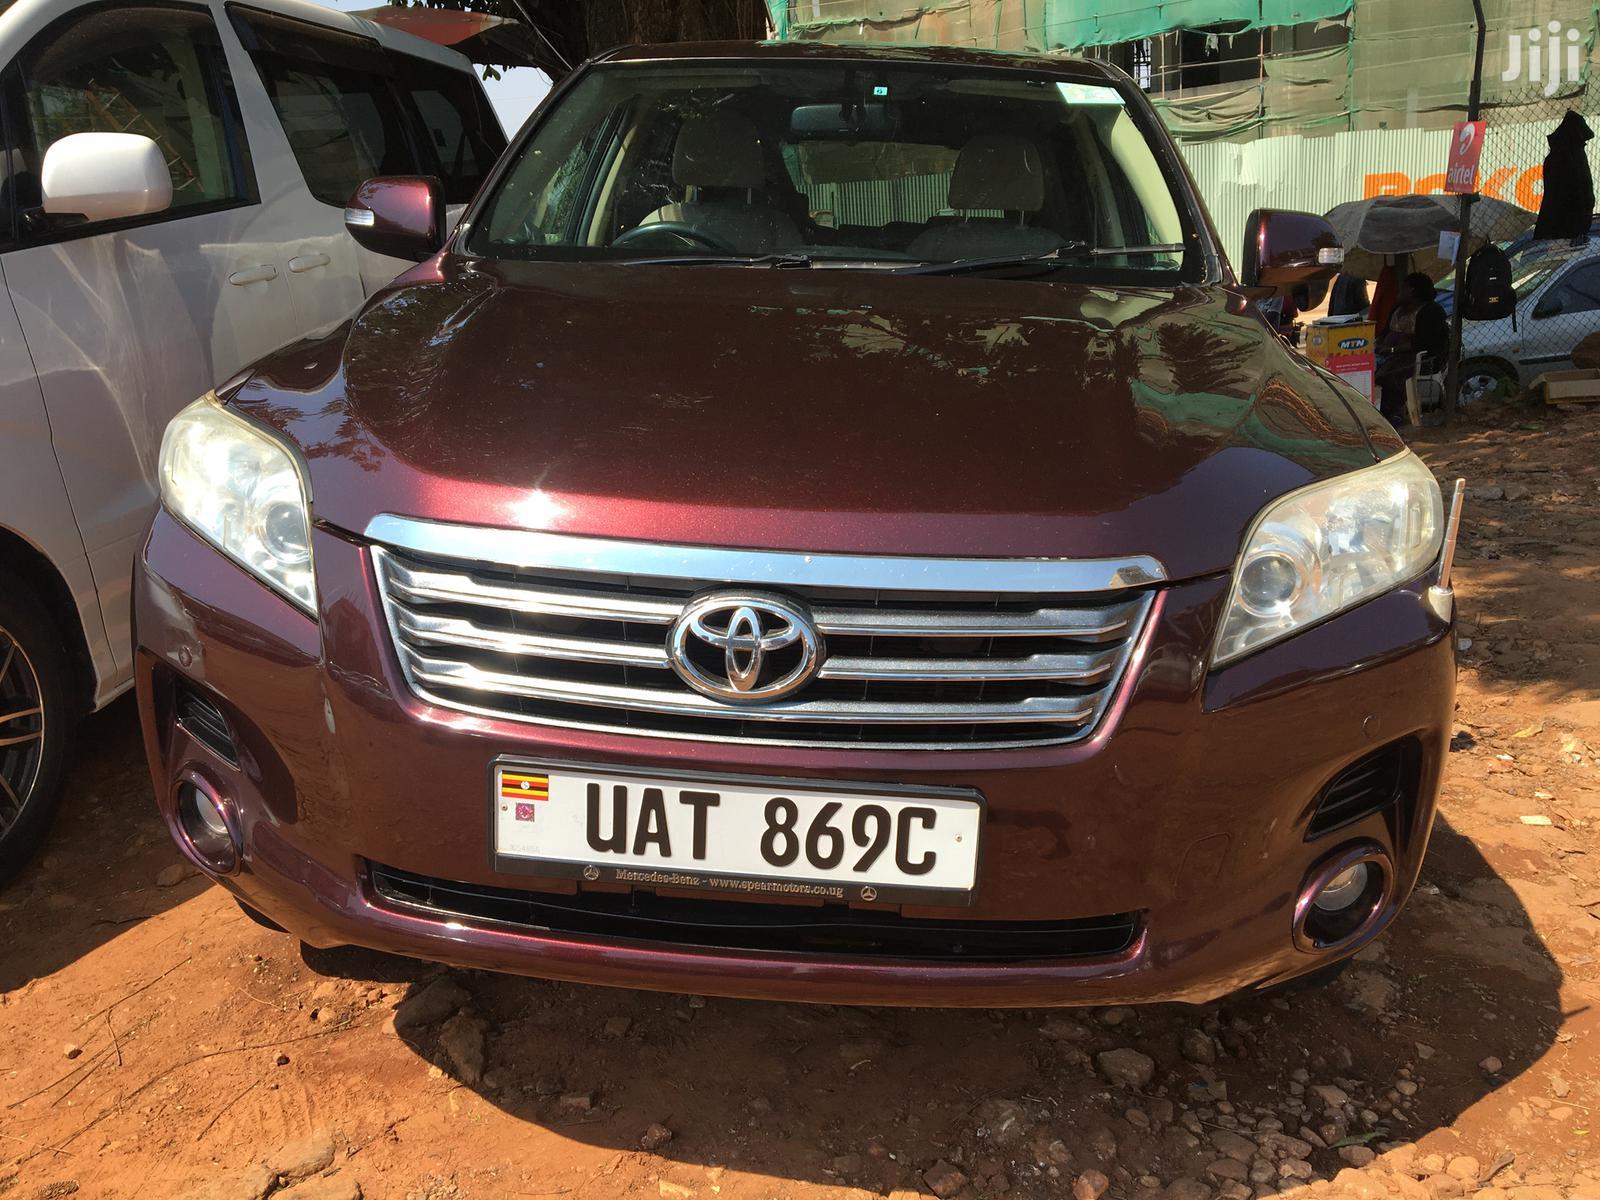 Toyota Vanguard 2009 | Cars for sale in Kampala, Central Region, Uganda